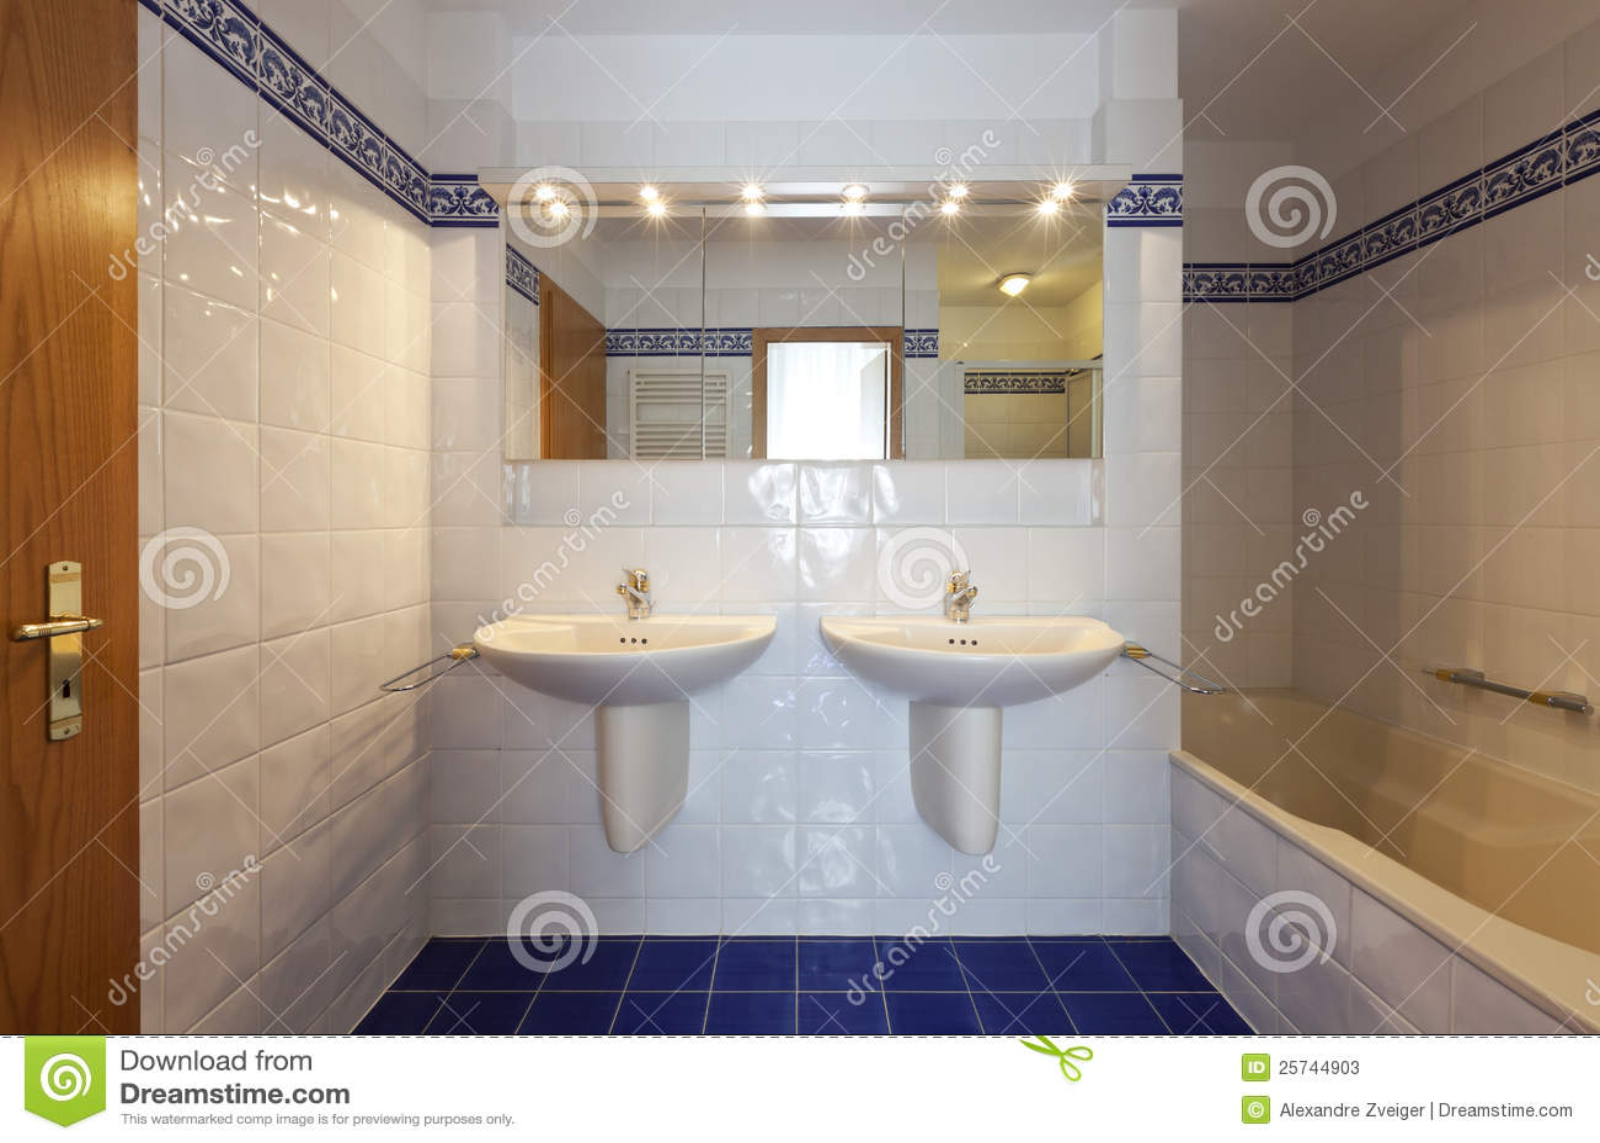 Interior house, bathroom